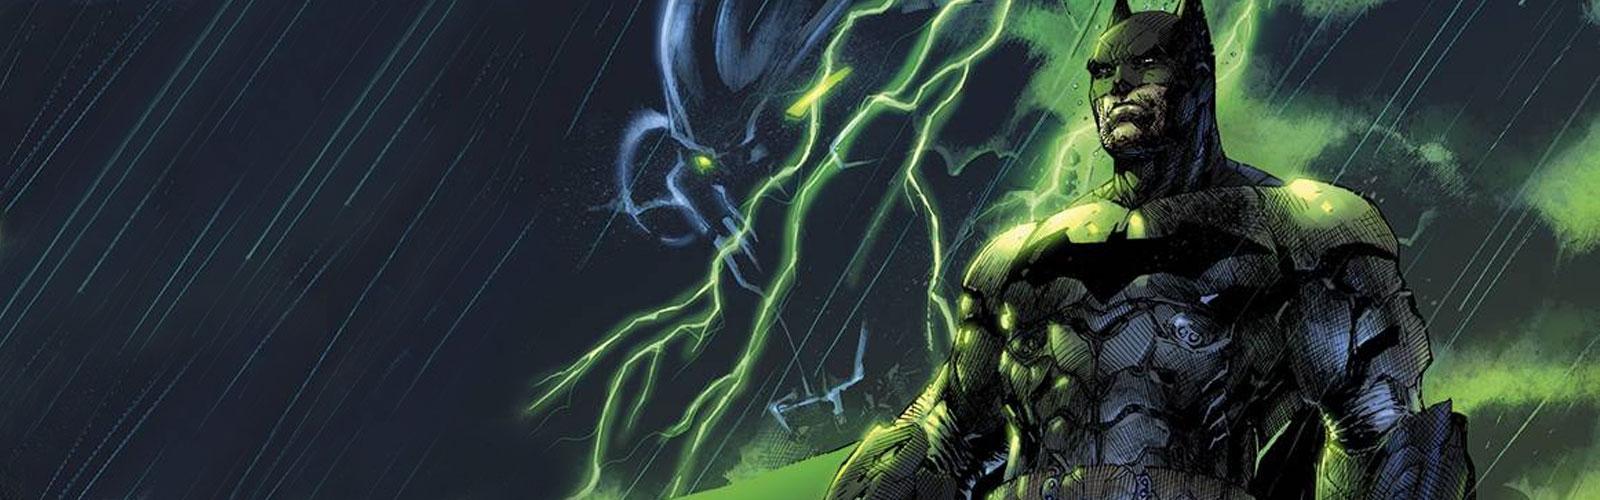 New Releases - 26-08-15: Batman - Arkham Knight: Genesis